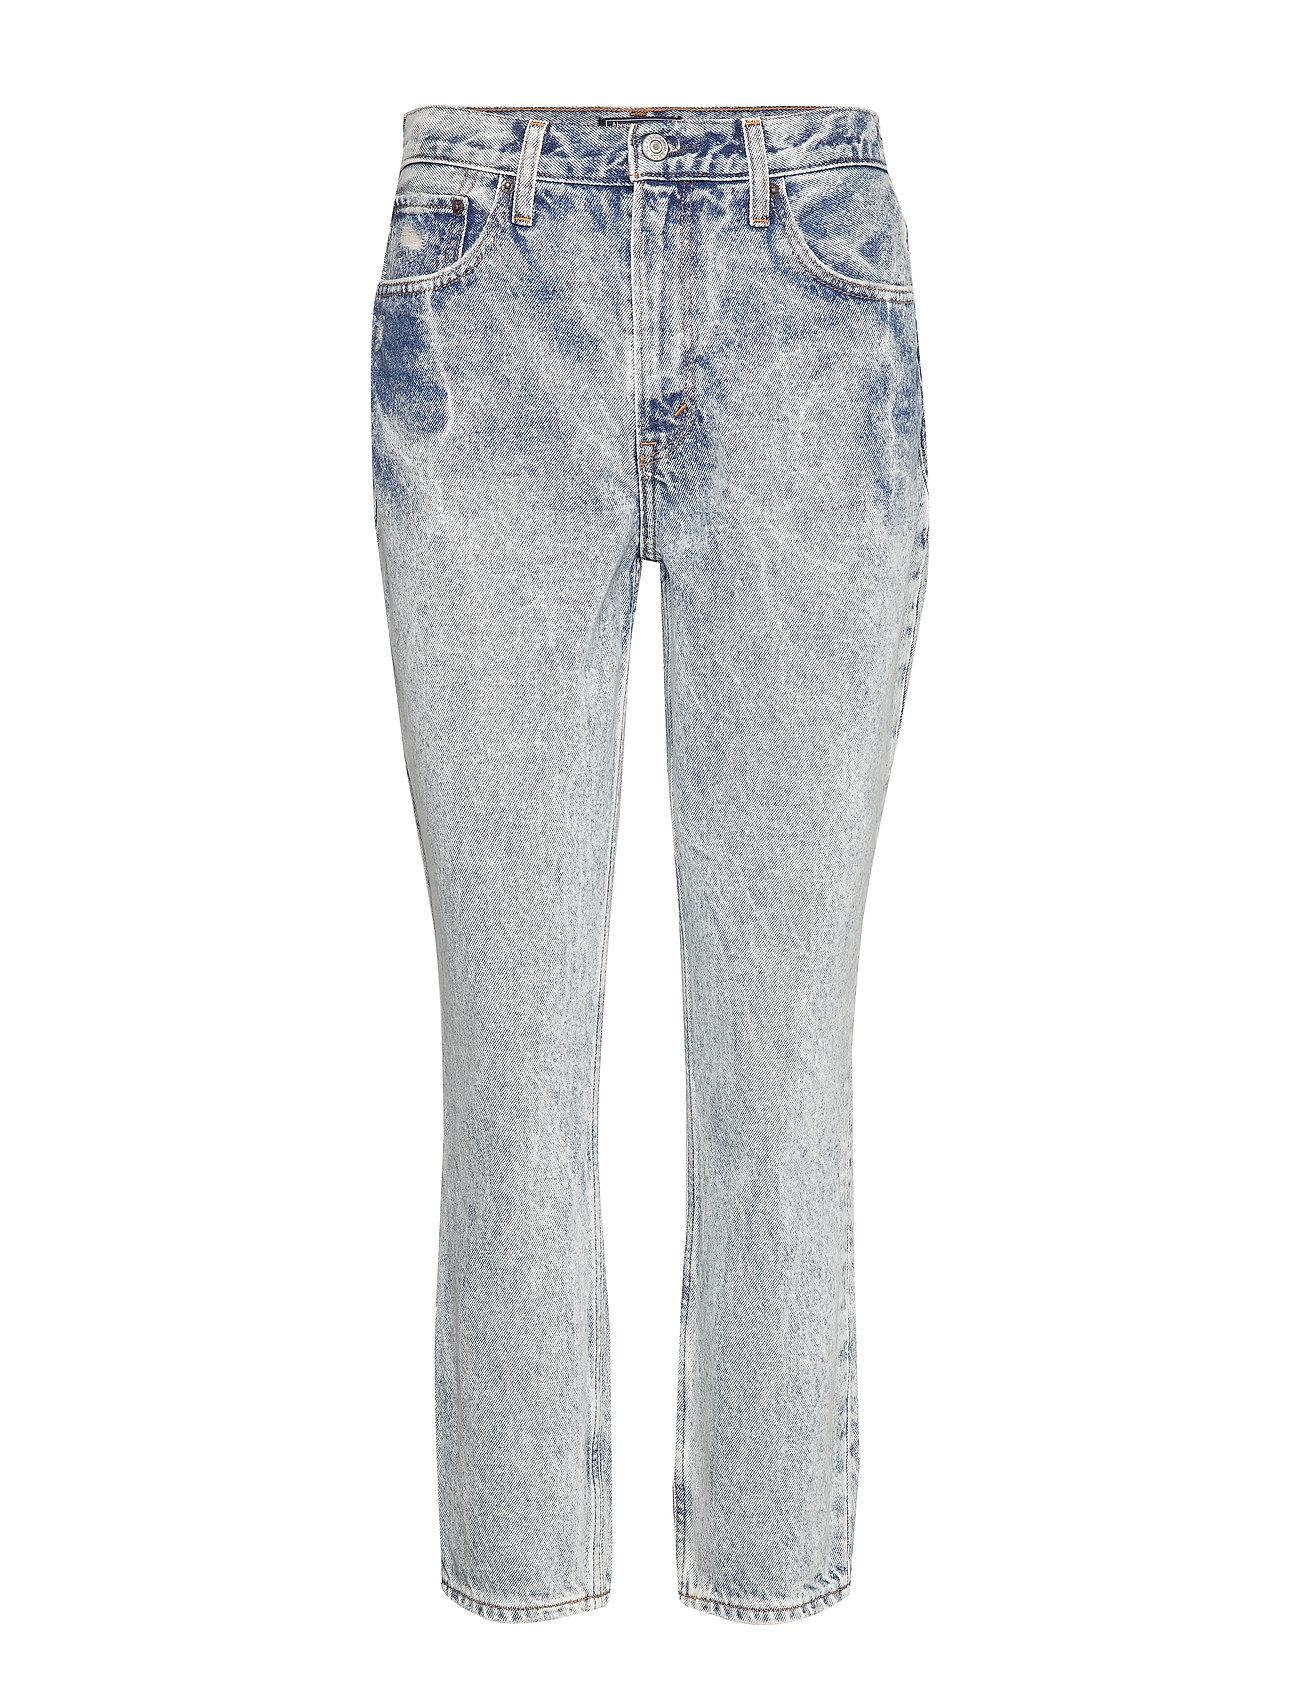 Abercrombie & Fitch Vintage Wash Mom Jeans - DARK